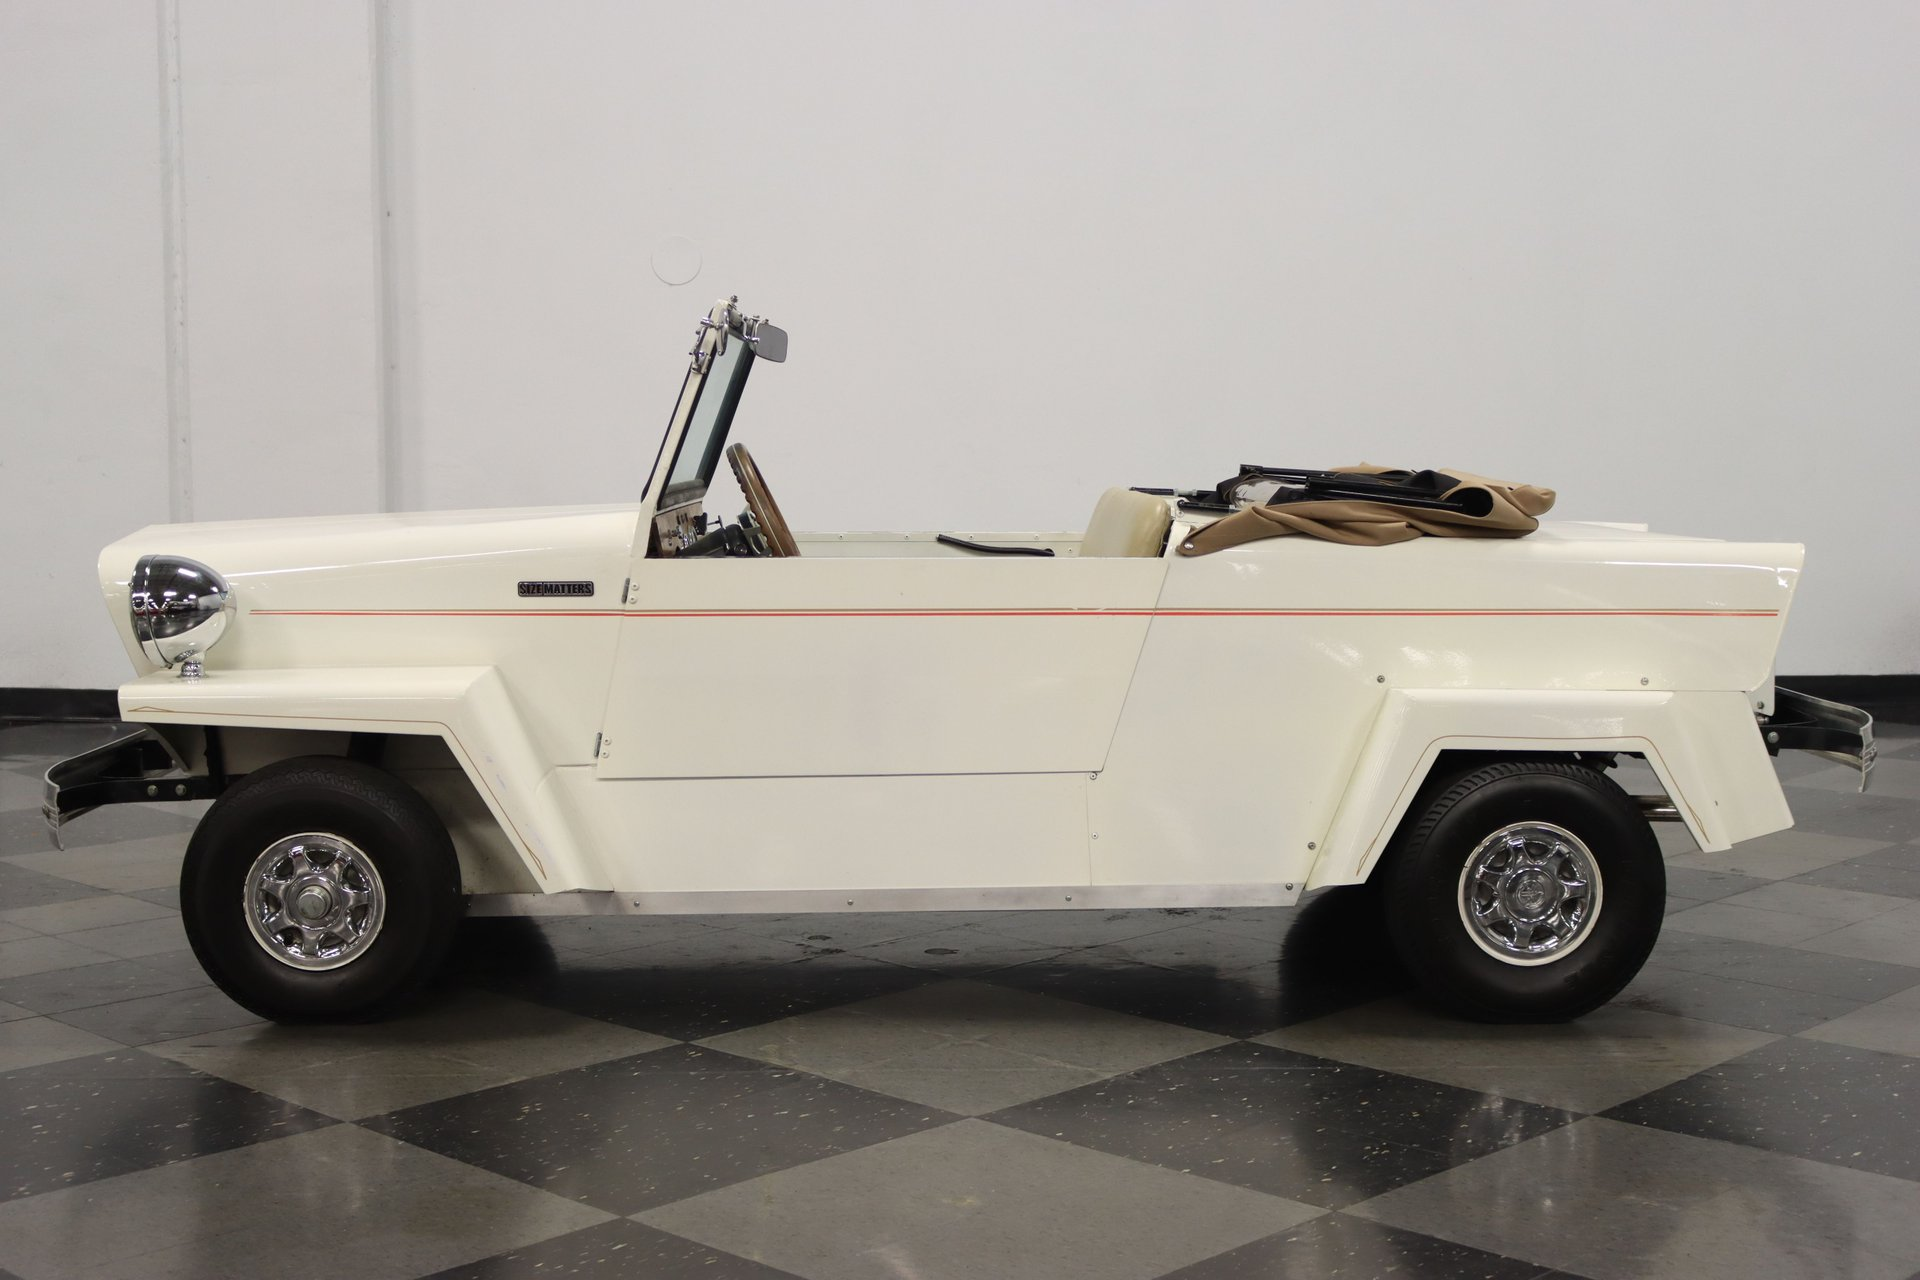 1960 king midget model 3 micro car